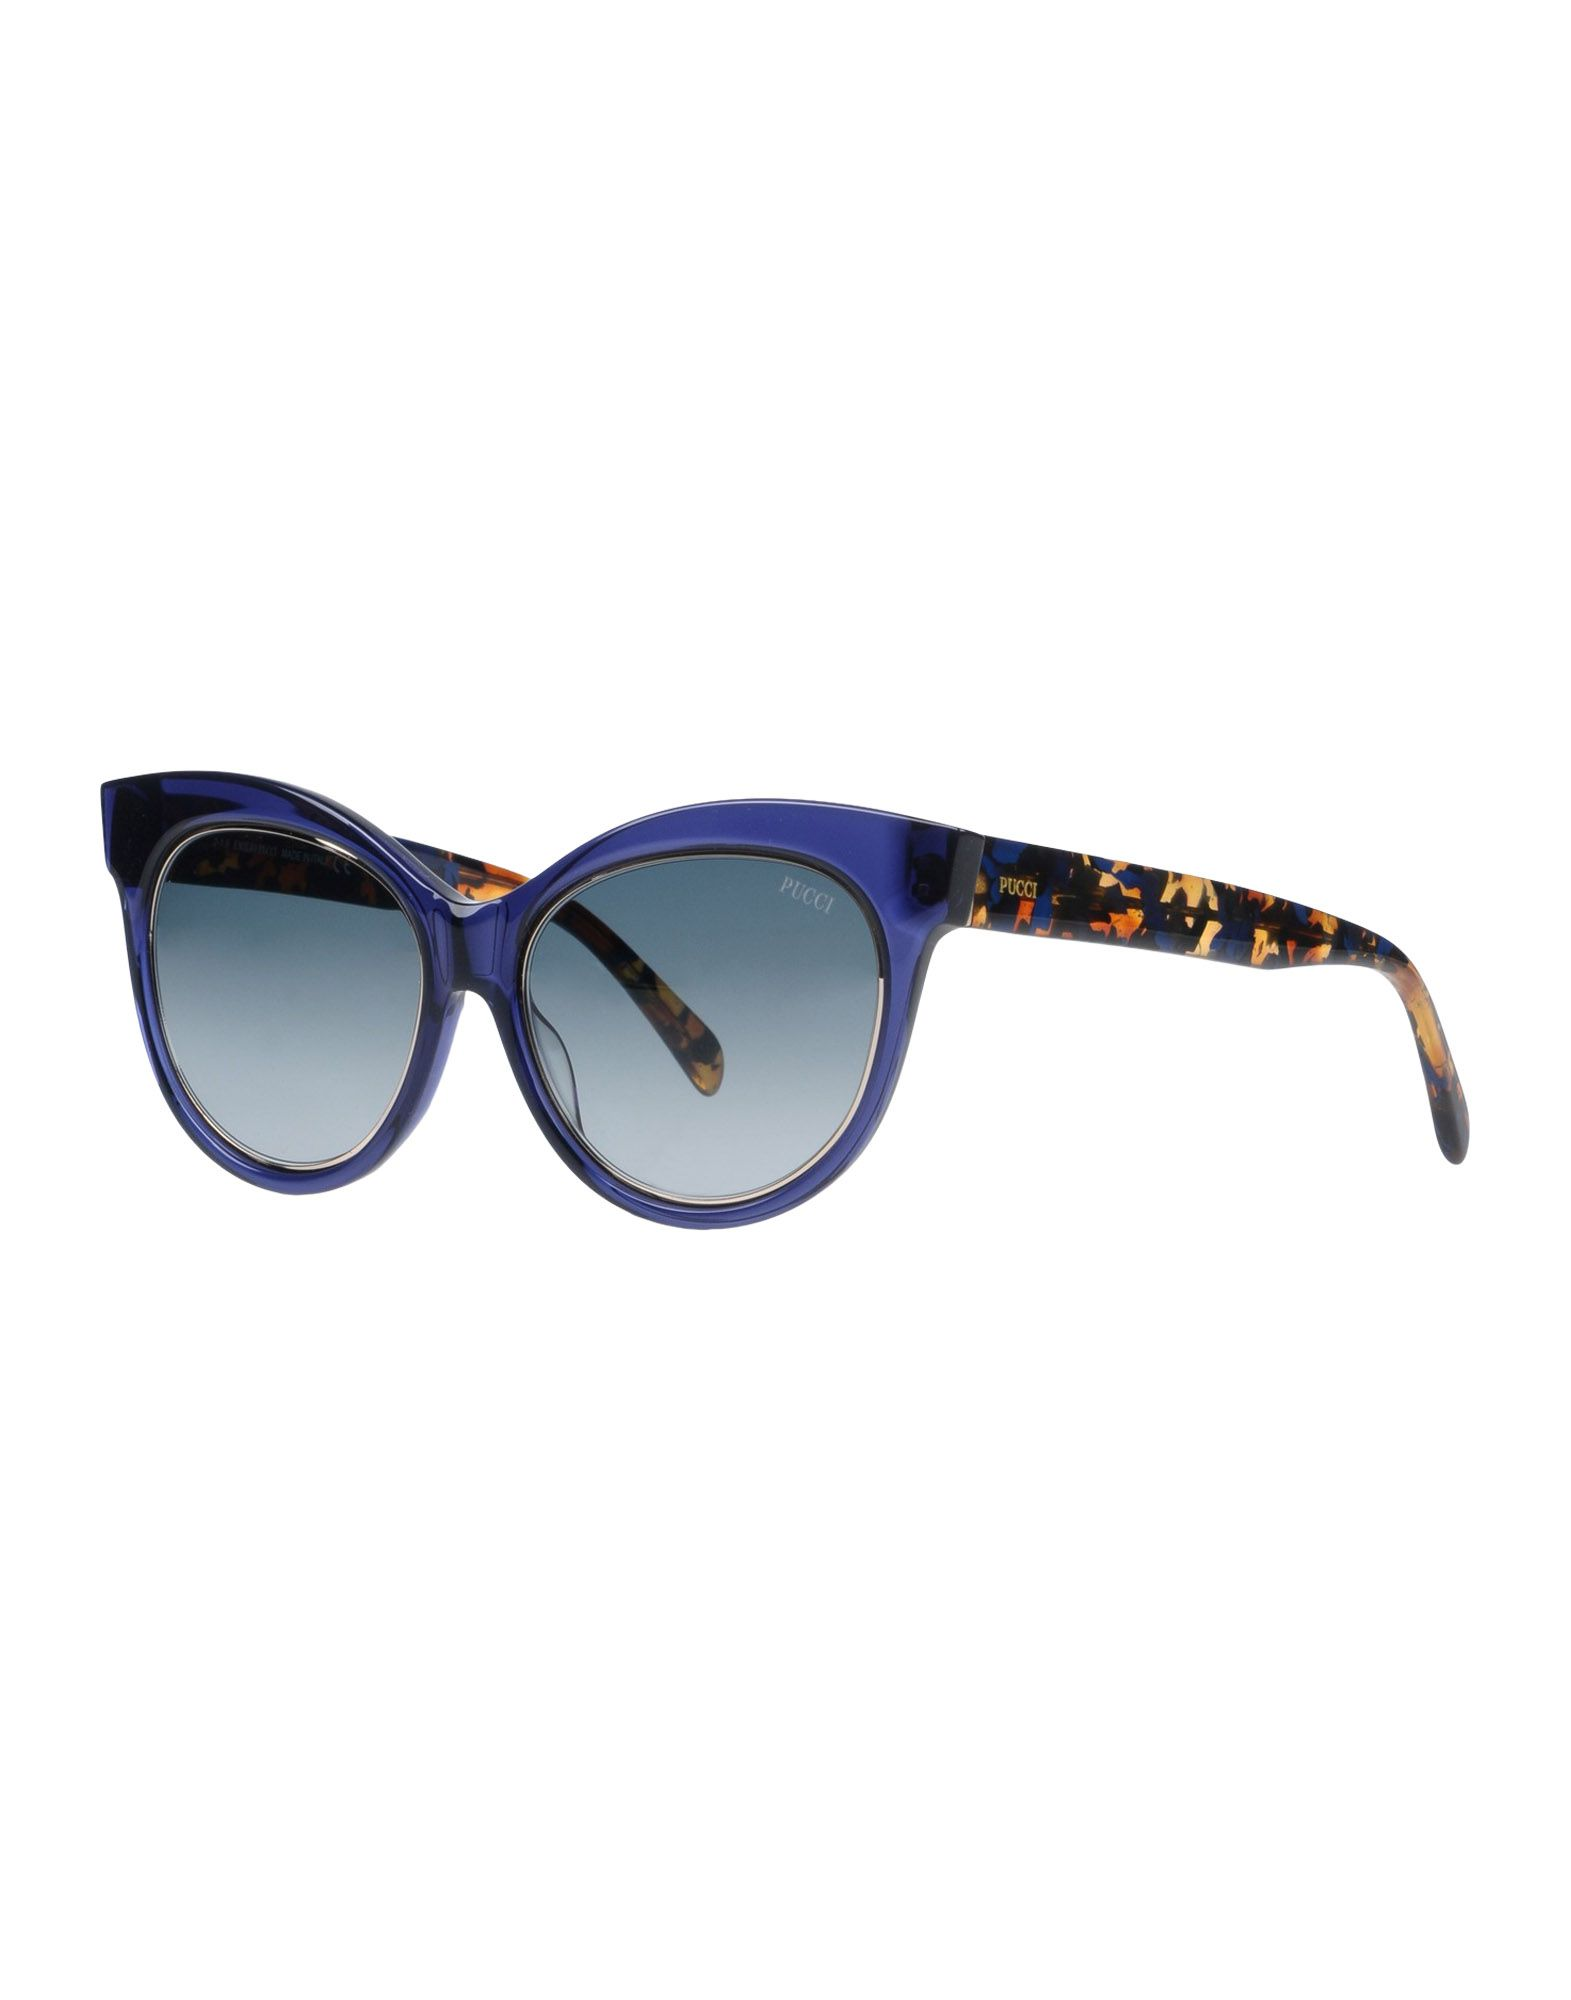 цена на EMILIO PUCCI Солнечные очки